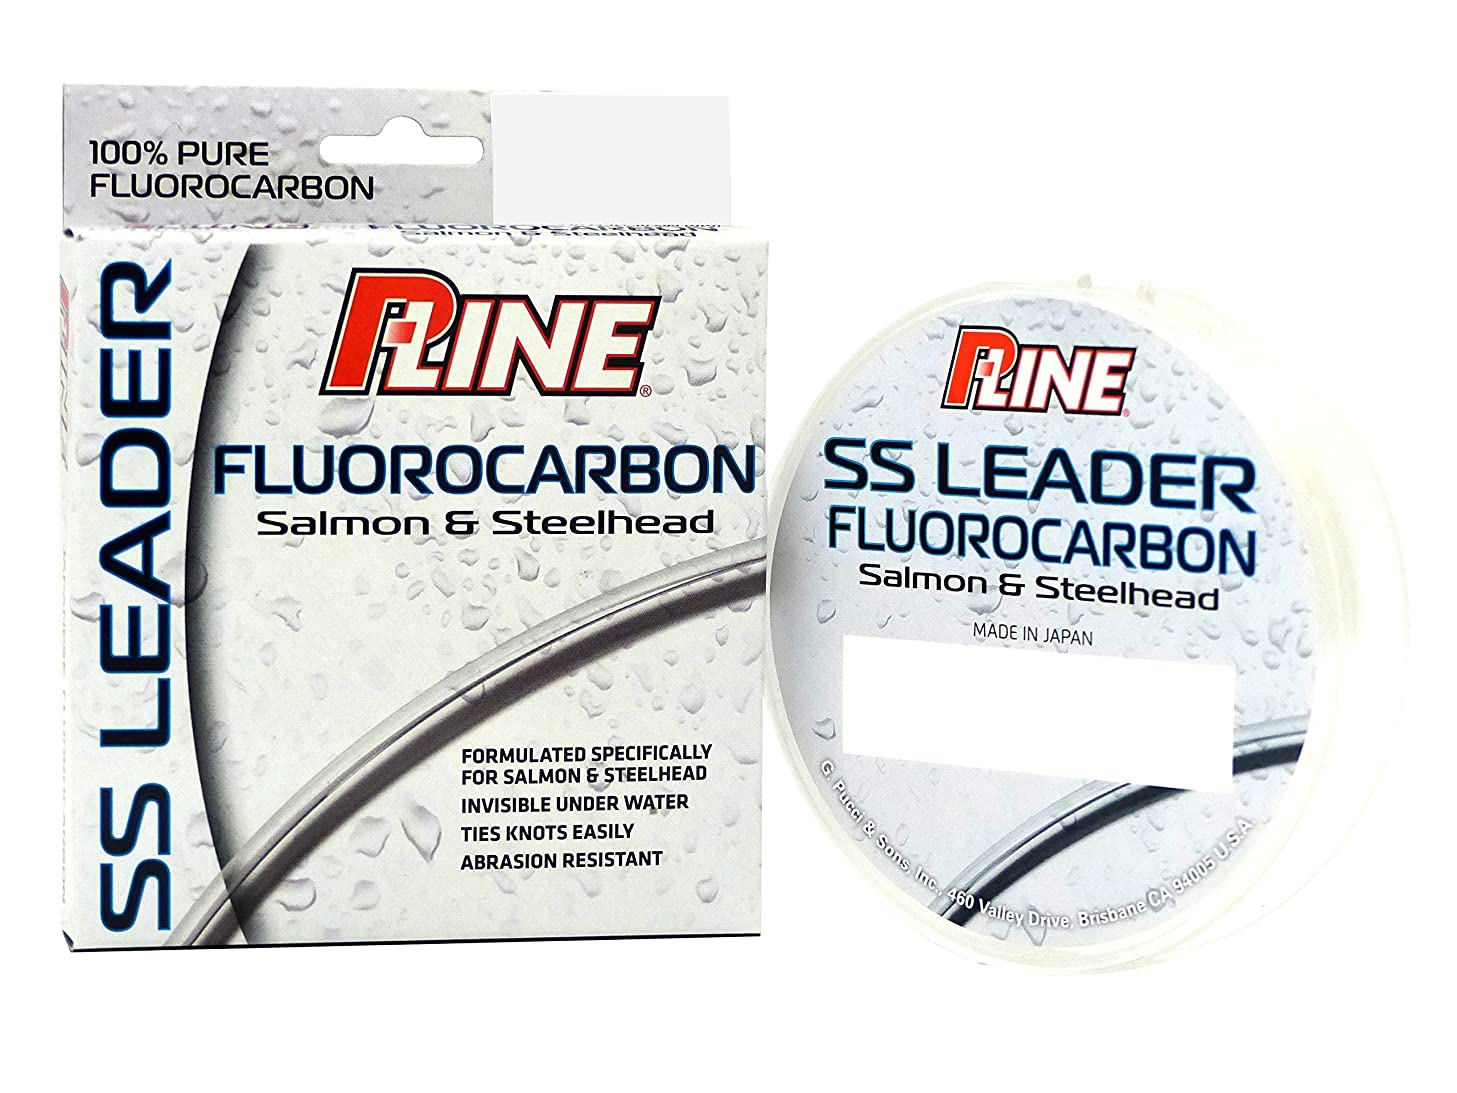 P-Line Salmon/Steelhead Select Fluorocarbon 100 yd Leader Material